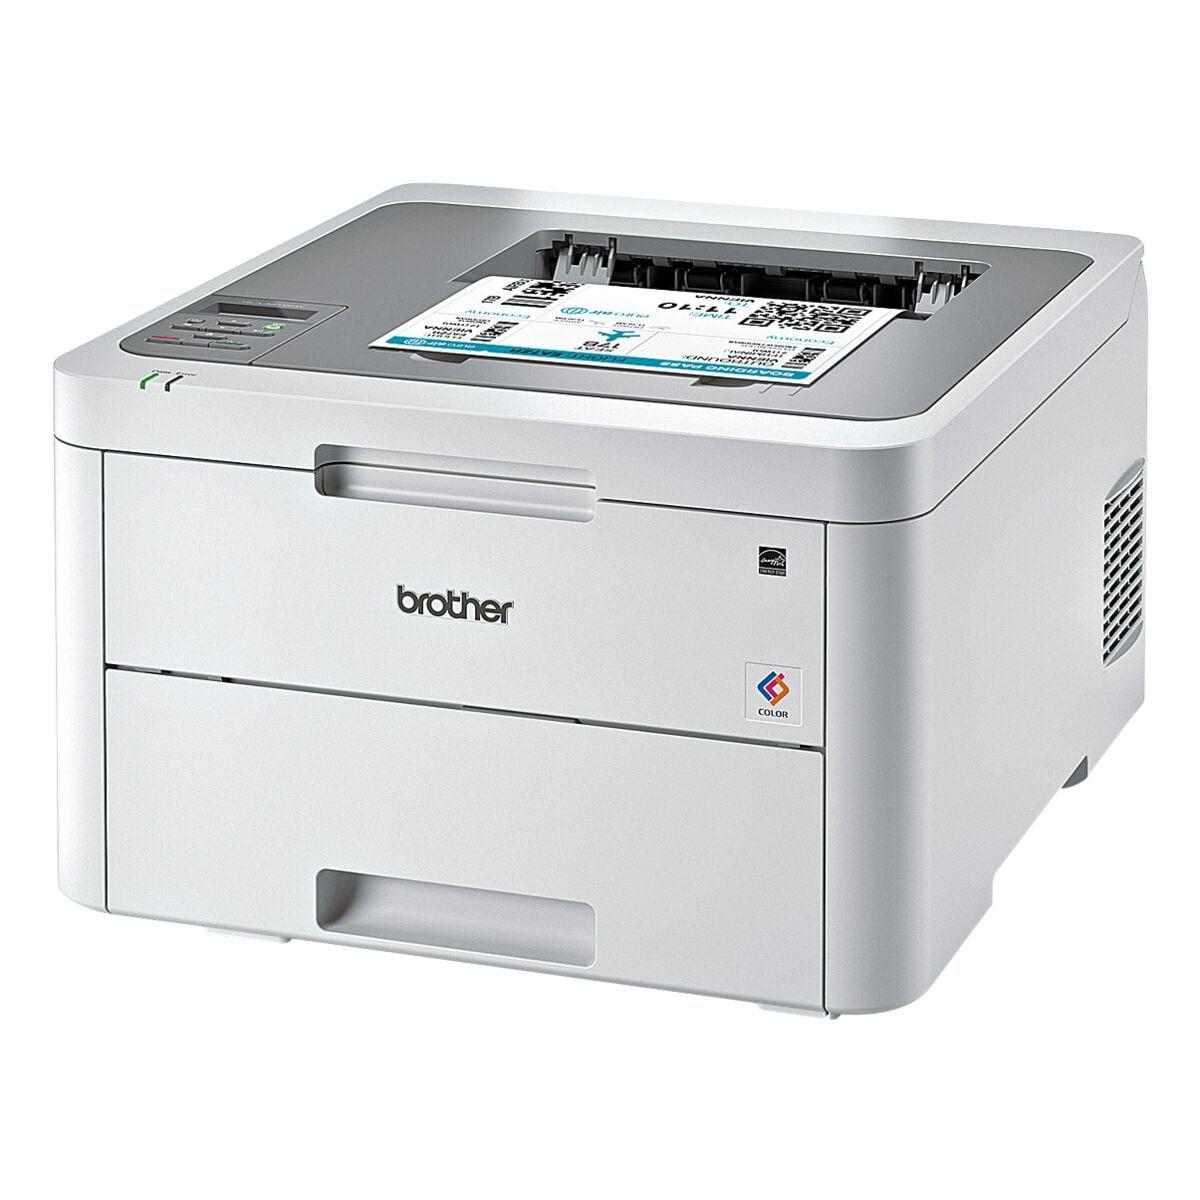 Brother HL-L3210CW Laserdrucker, A4 Farb-Laserdrucker, 2400 x 600 dpi, mit WLAN